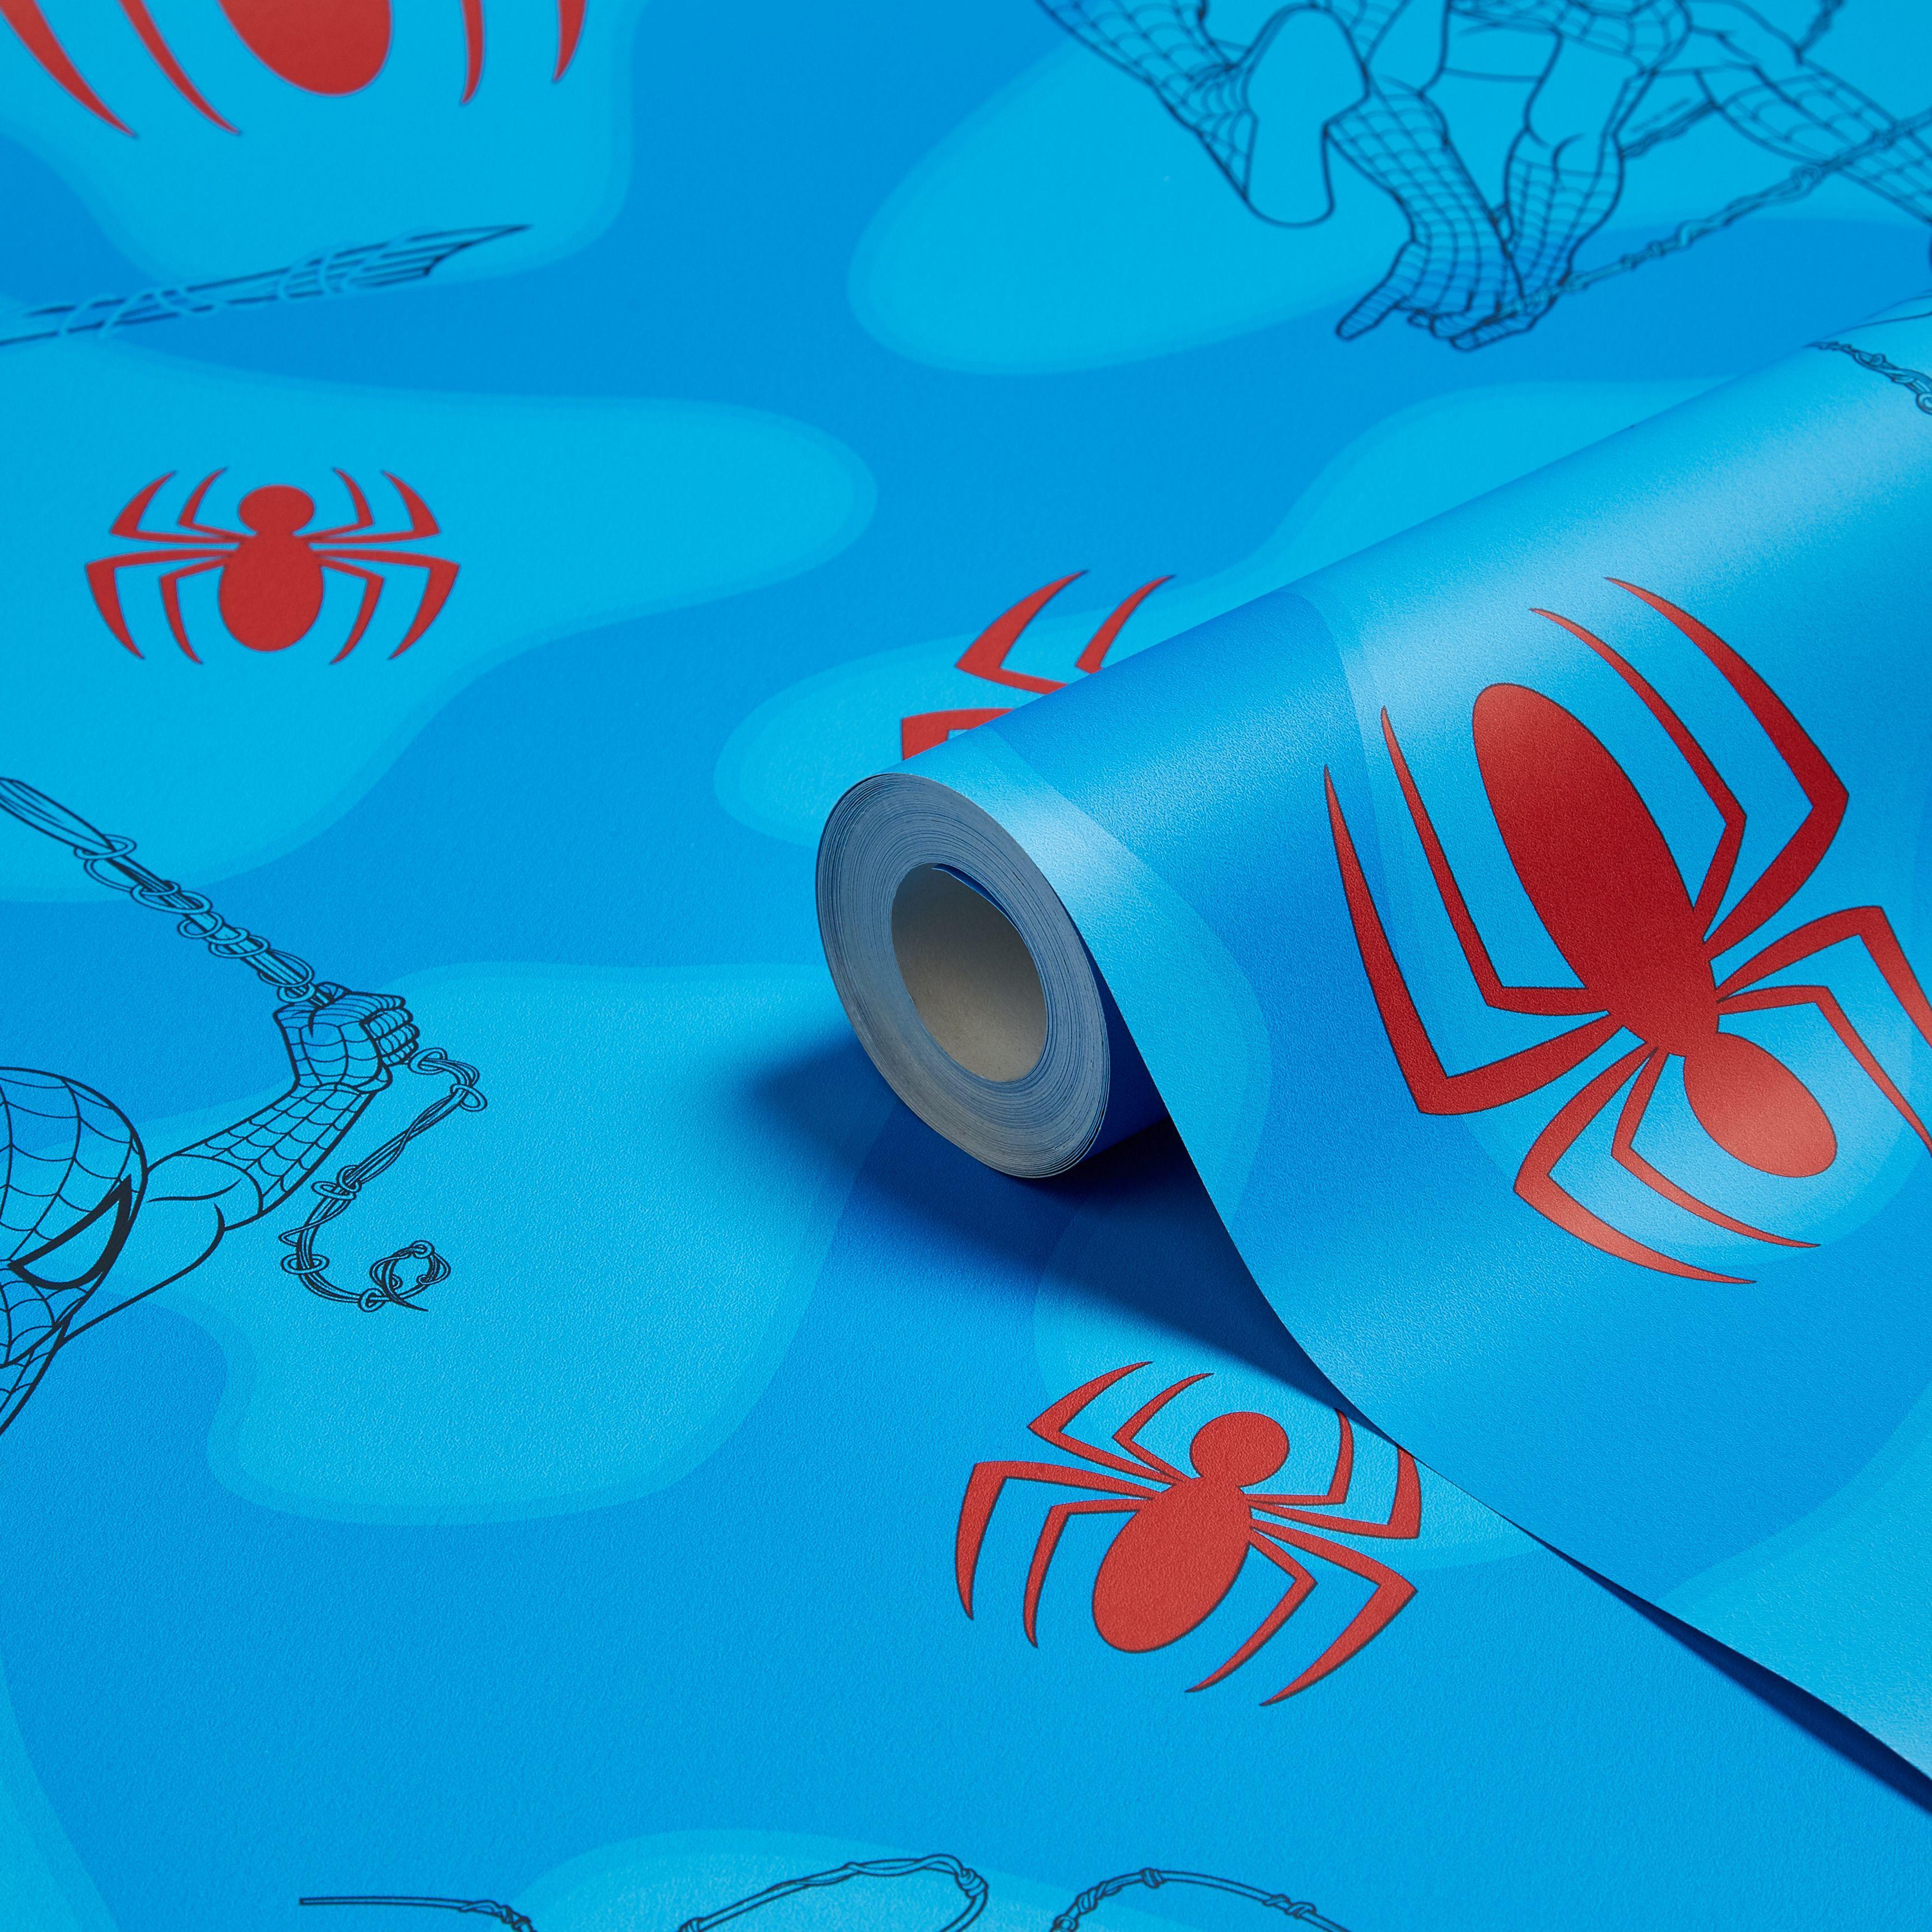 marvel marvel spiderman marvel spiderman wallpaper | departments